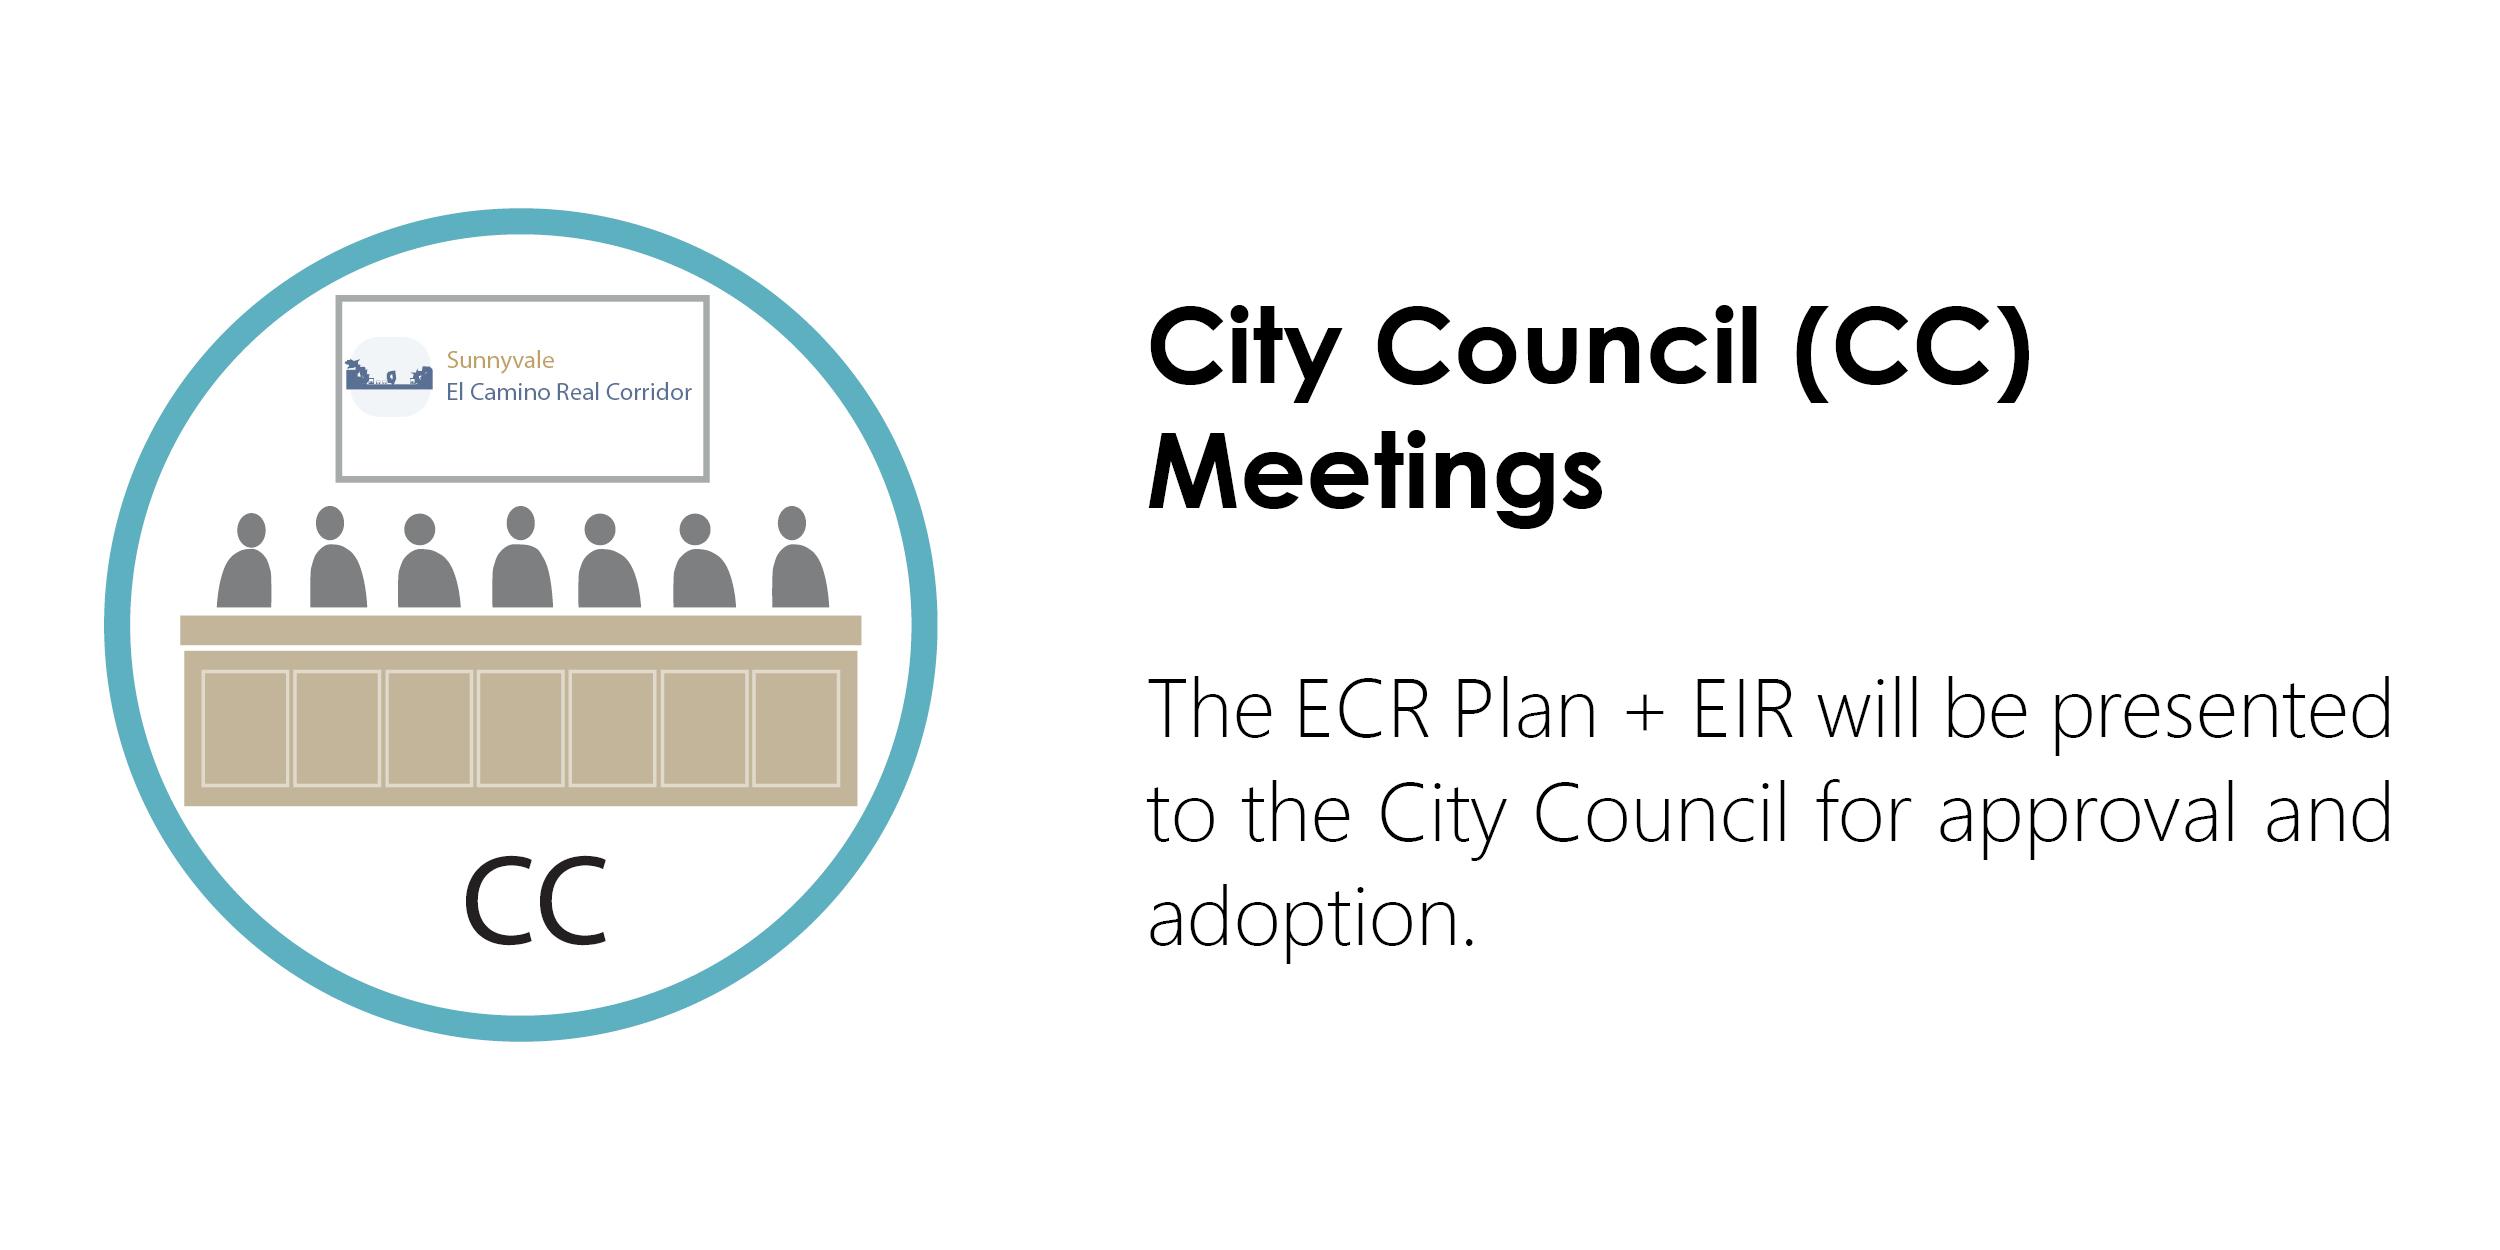 Logo and description of City Council Meetings.